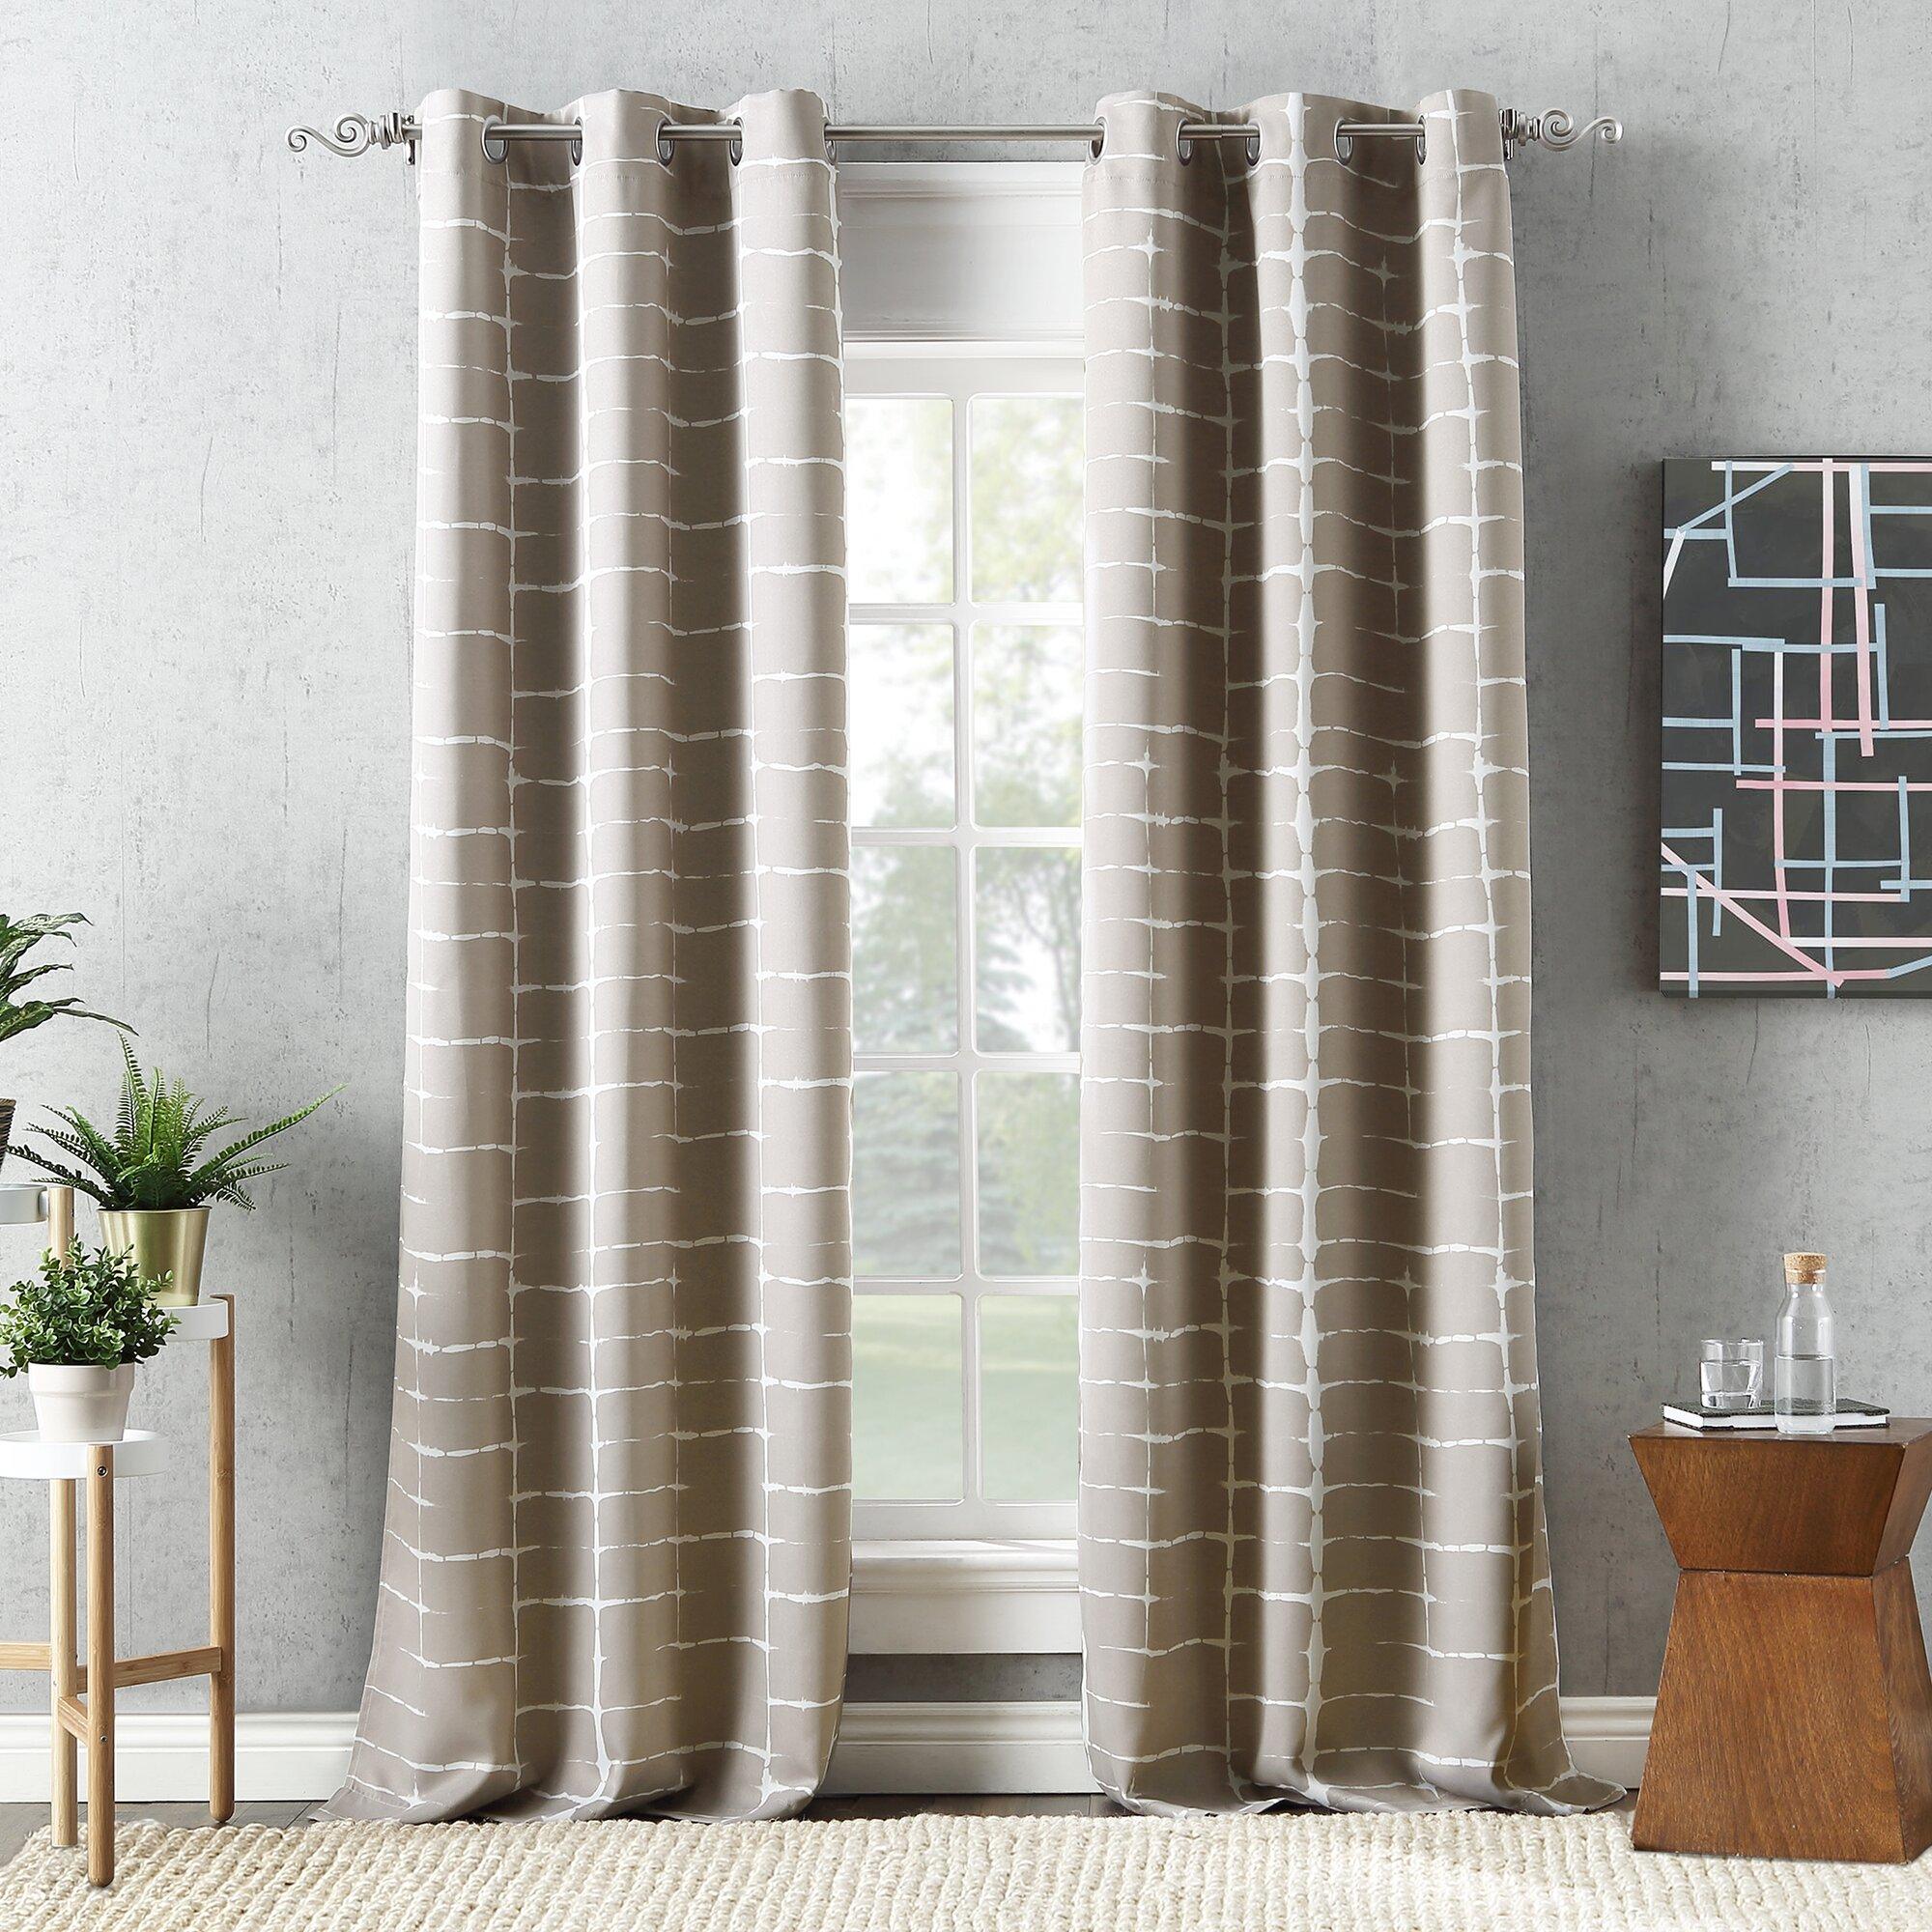 Wacker Shibori Print Striped Blackout Thermal Grommet Single Curtain Panel